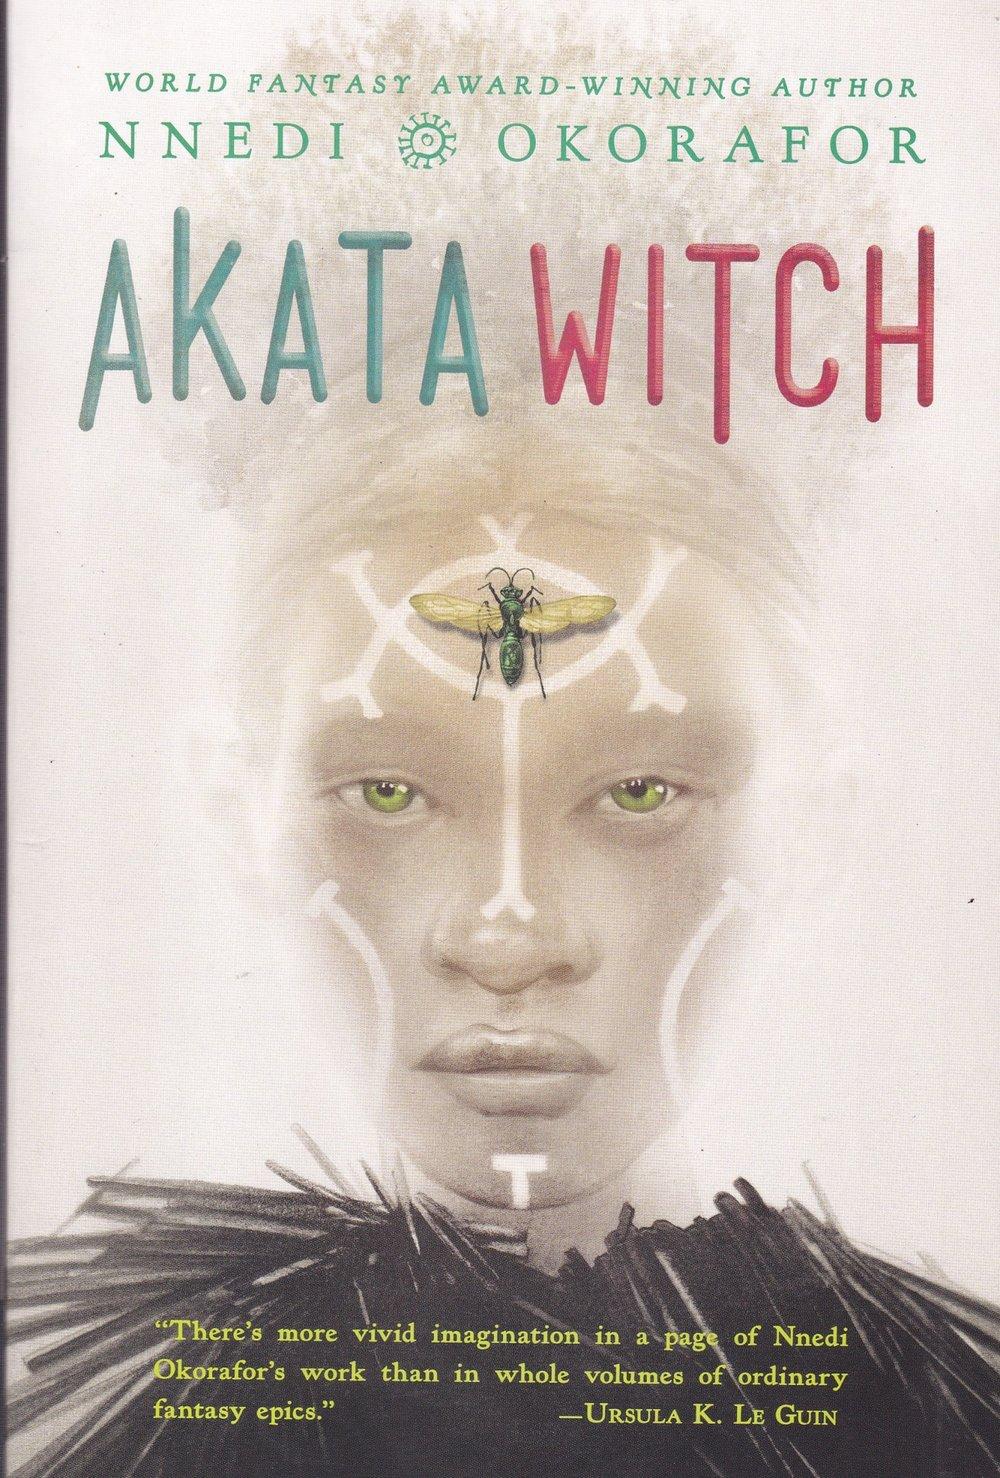 akata witch.jpg